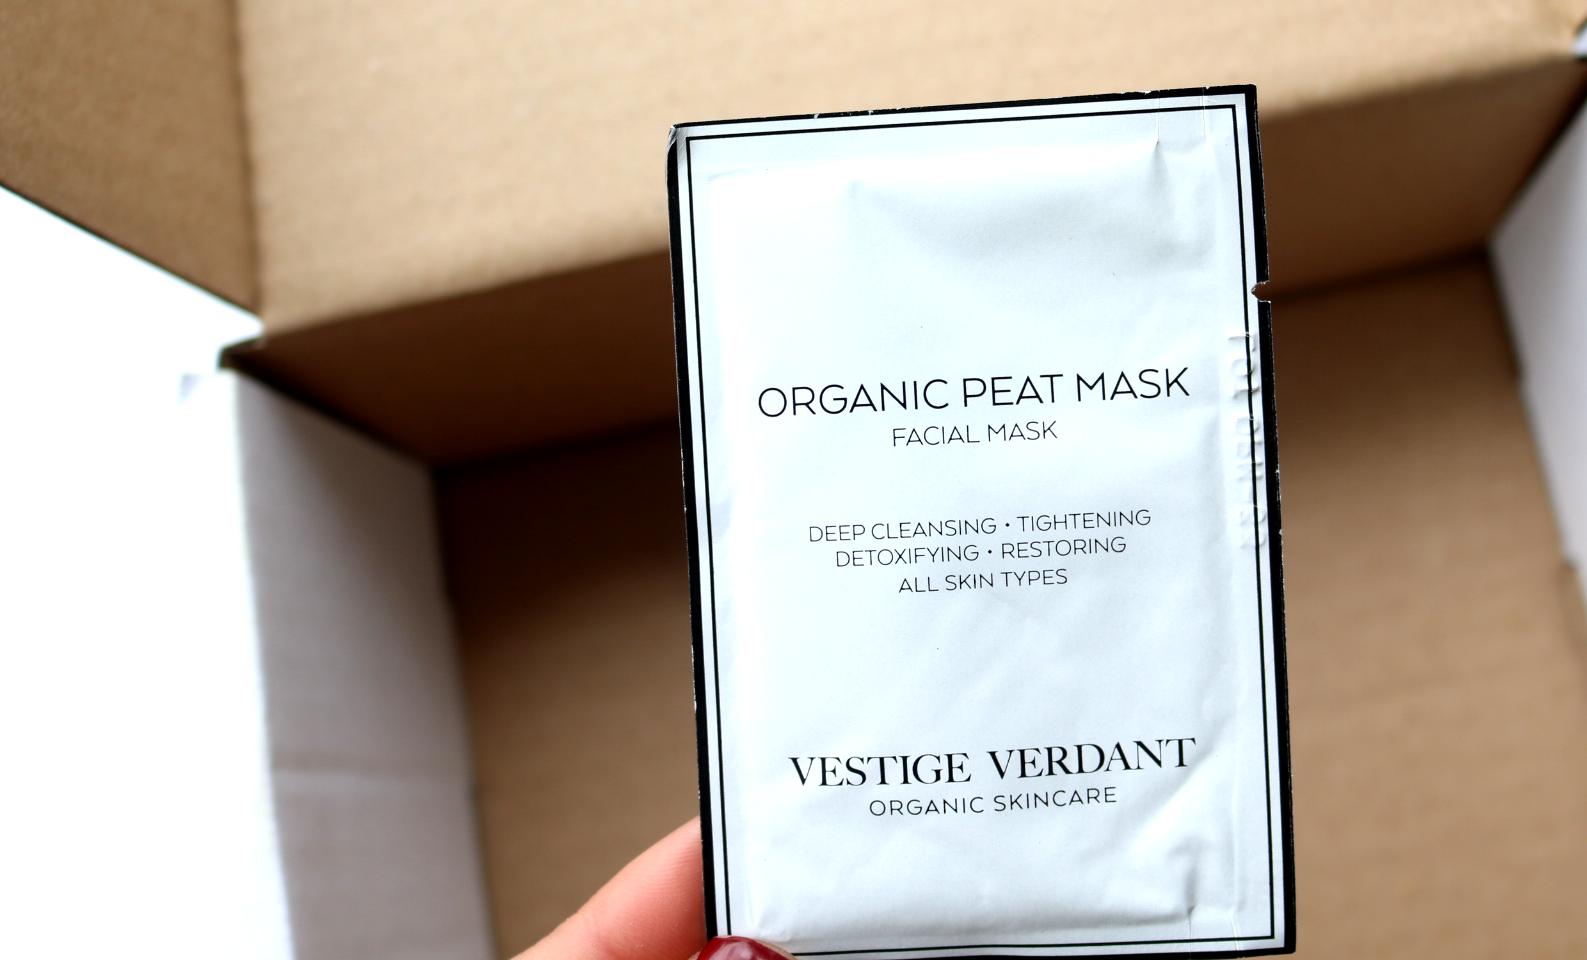 Vestige Verdant Peat Mask